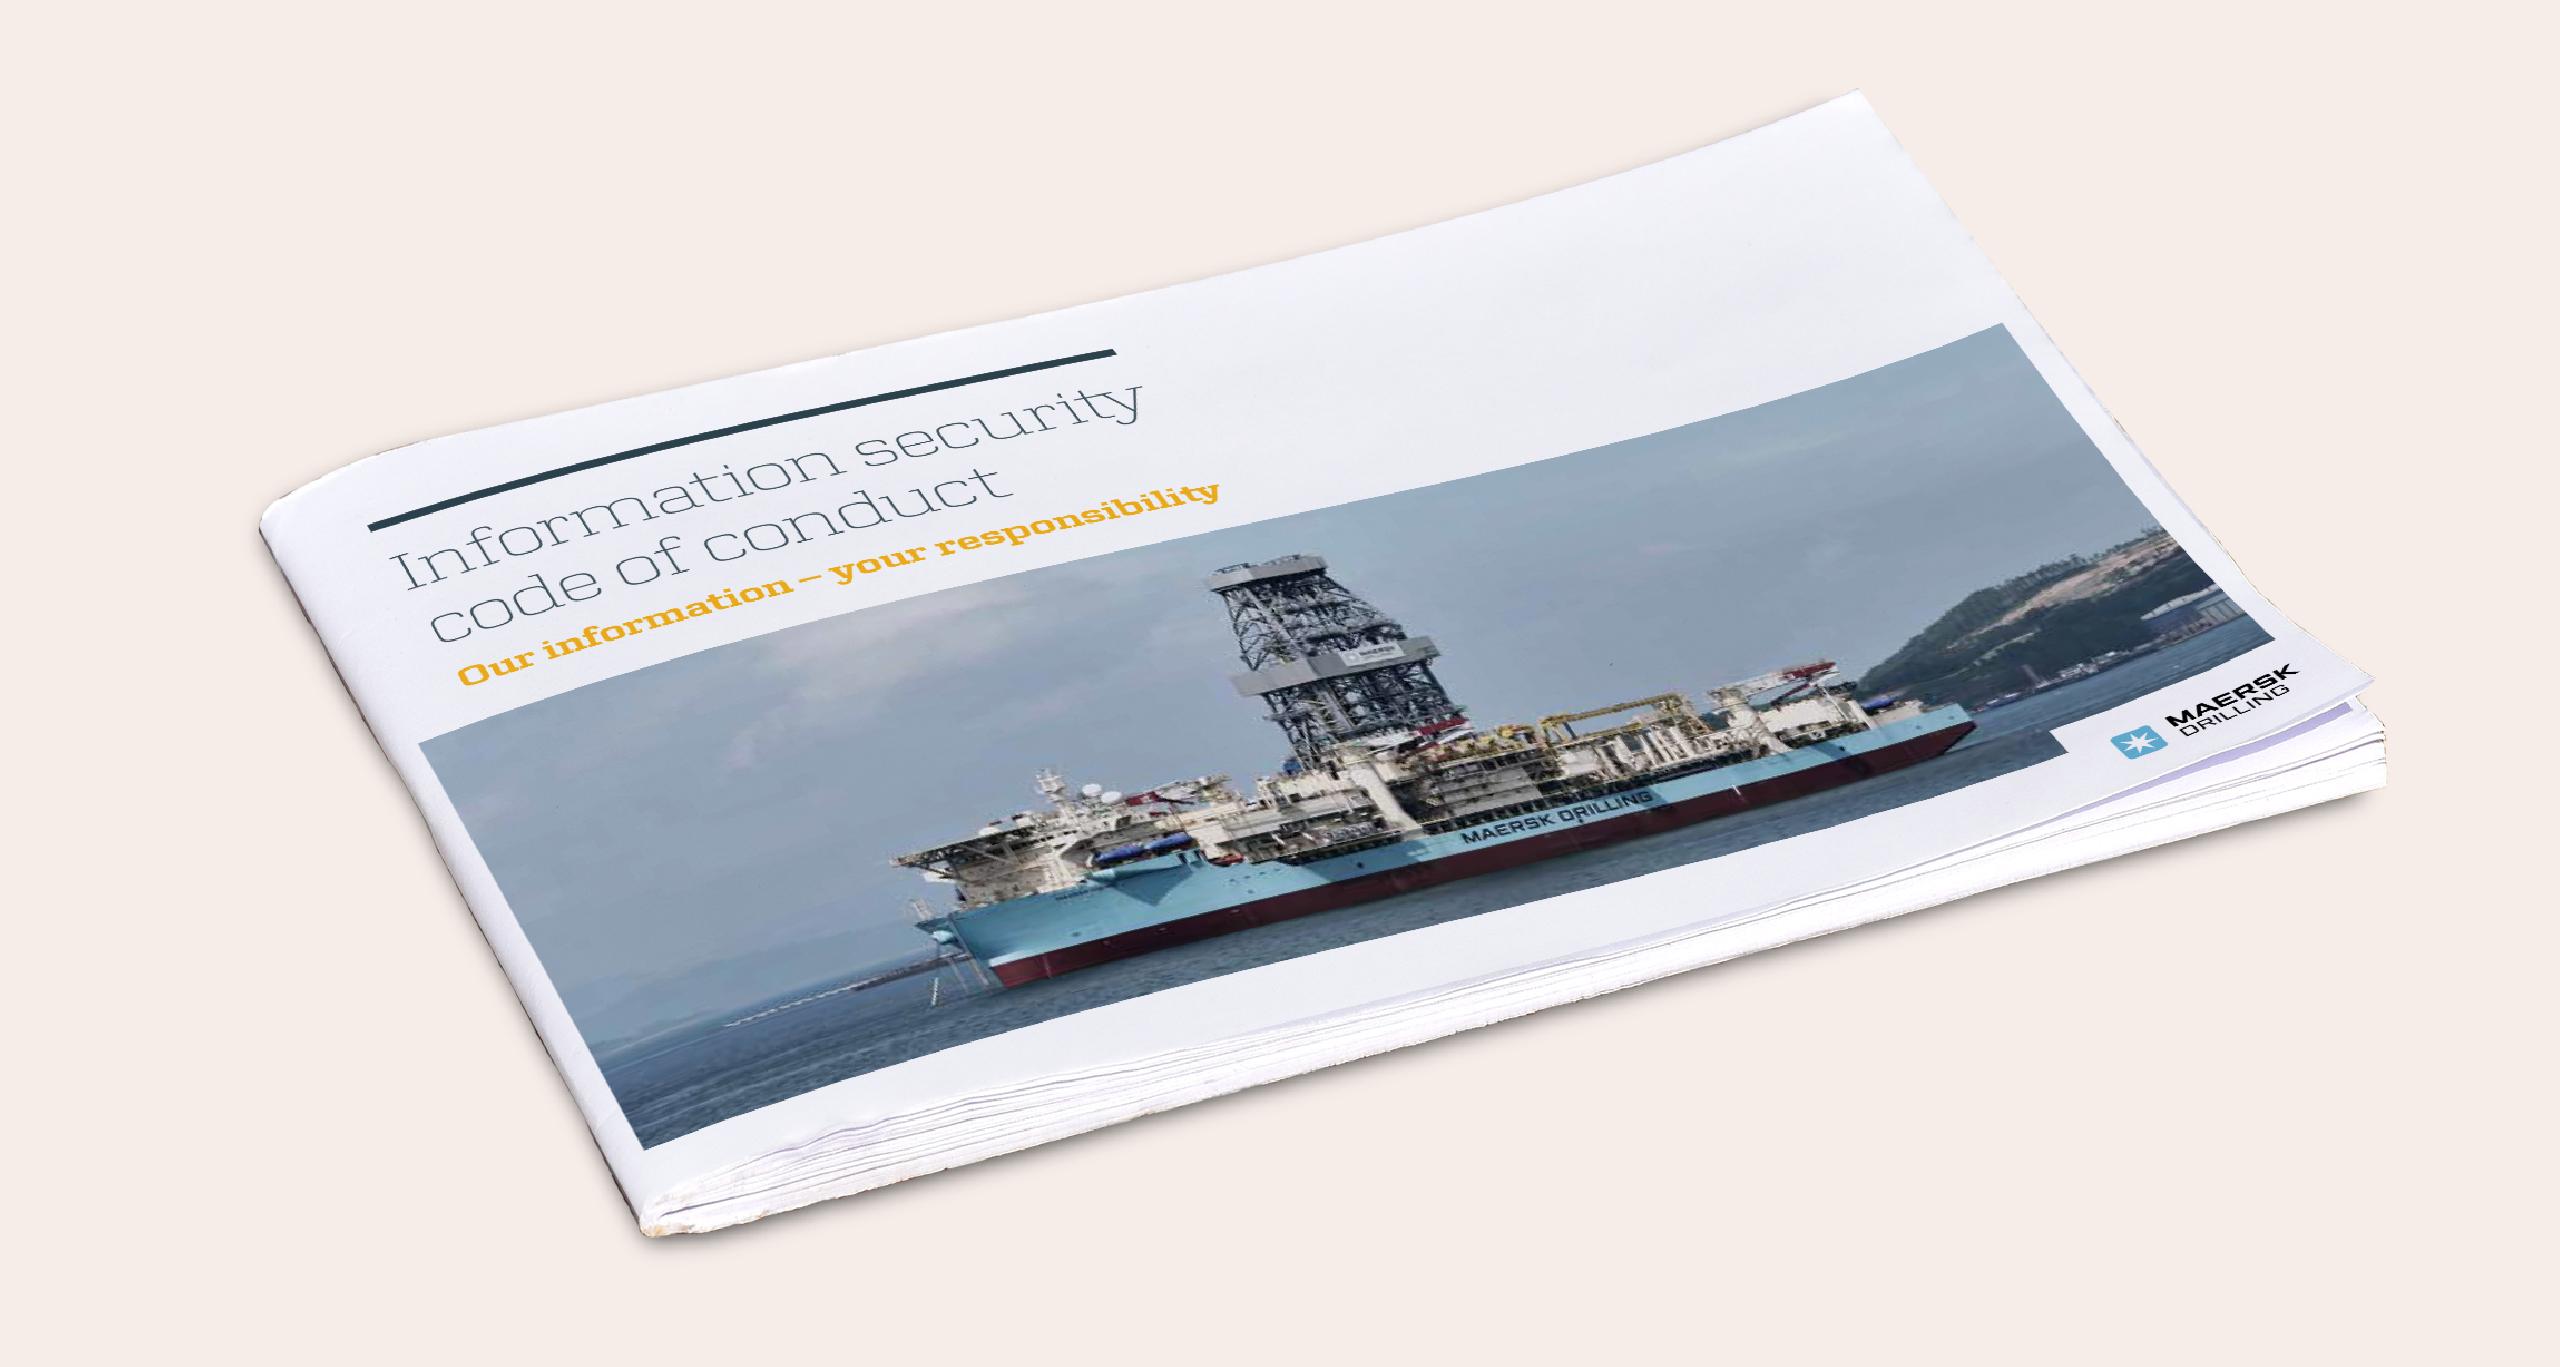 Maersk Drilling IT sikkerhed